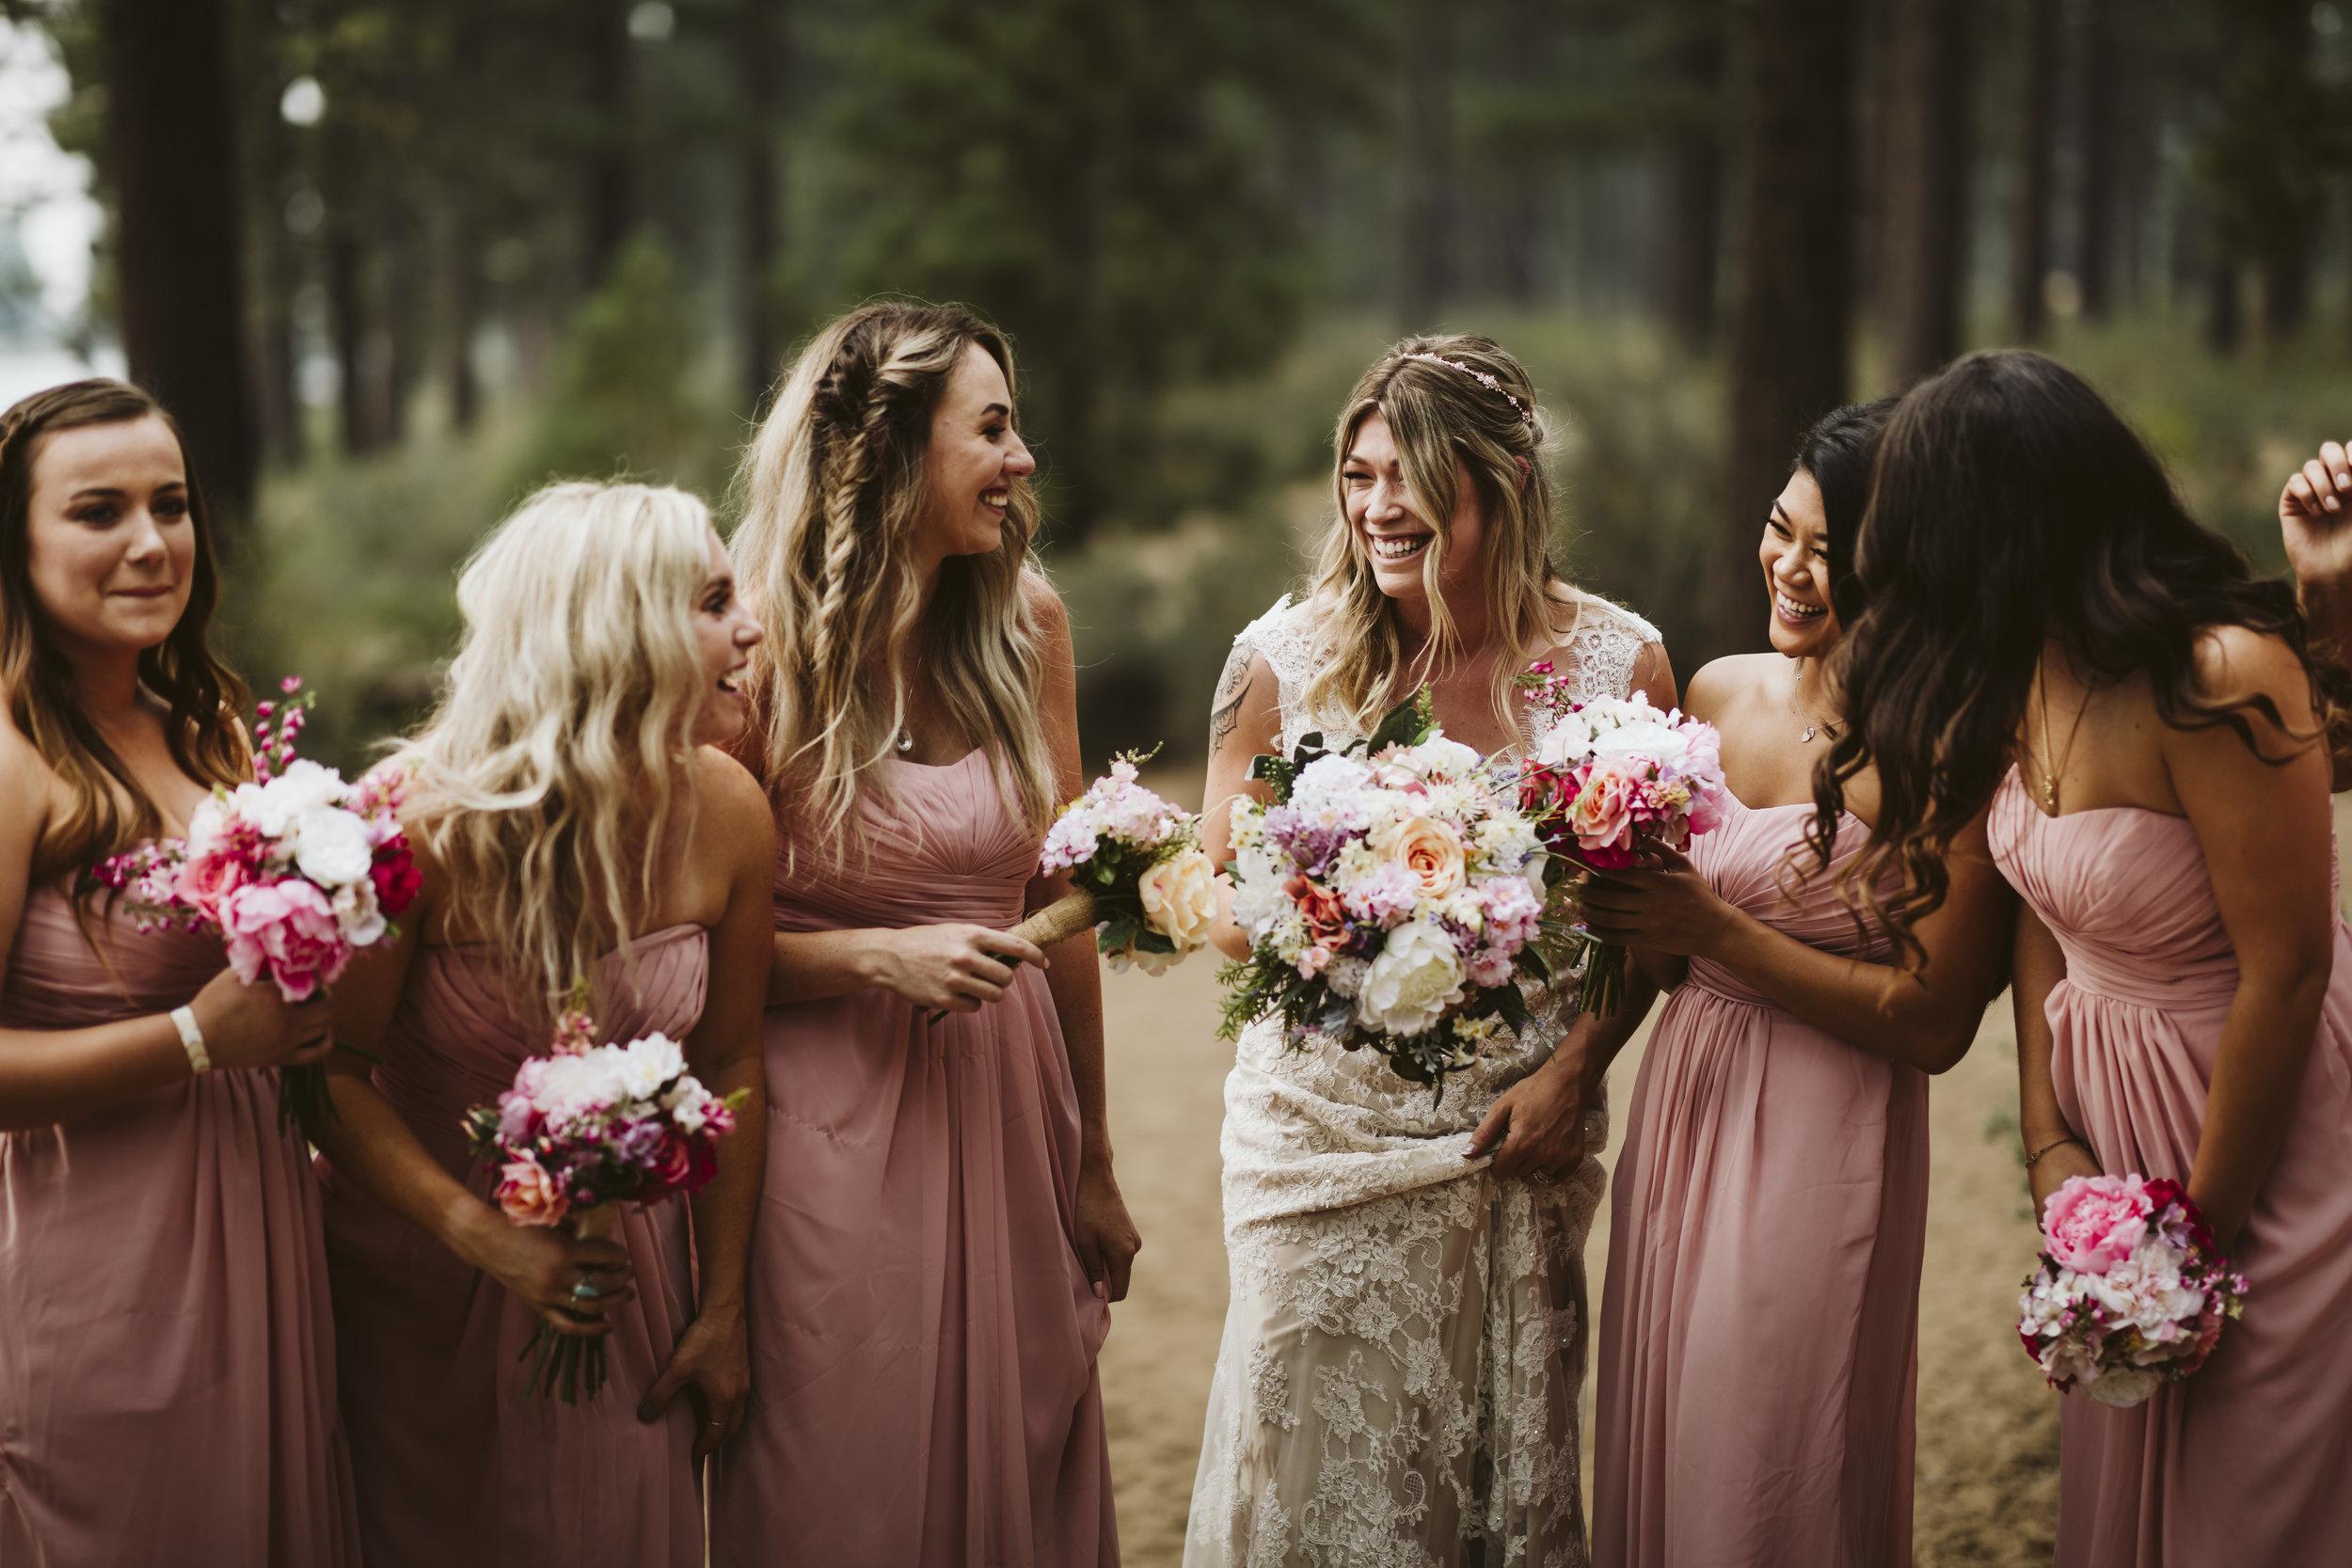 _P8A4530vild-vild photography-photography-wedding-wedding photography-tahoe-lake tahoe-lake tahoe wedding photographer-nevada wedding photographer-mountain wedding.jpg